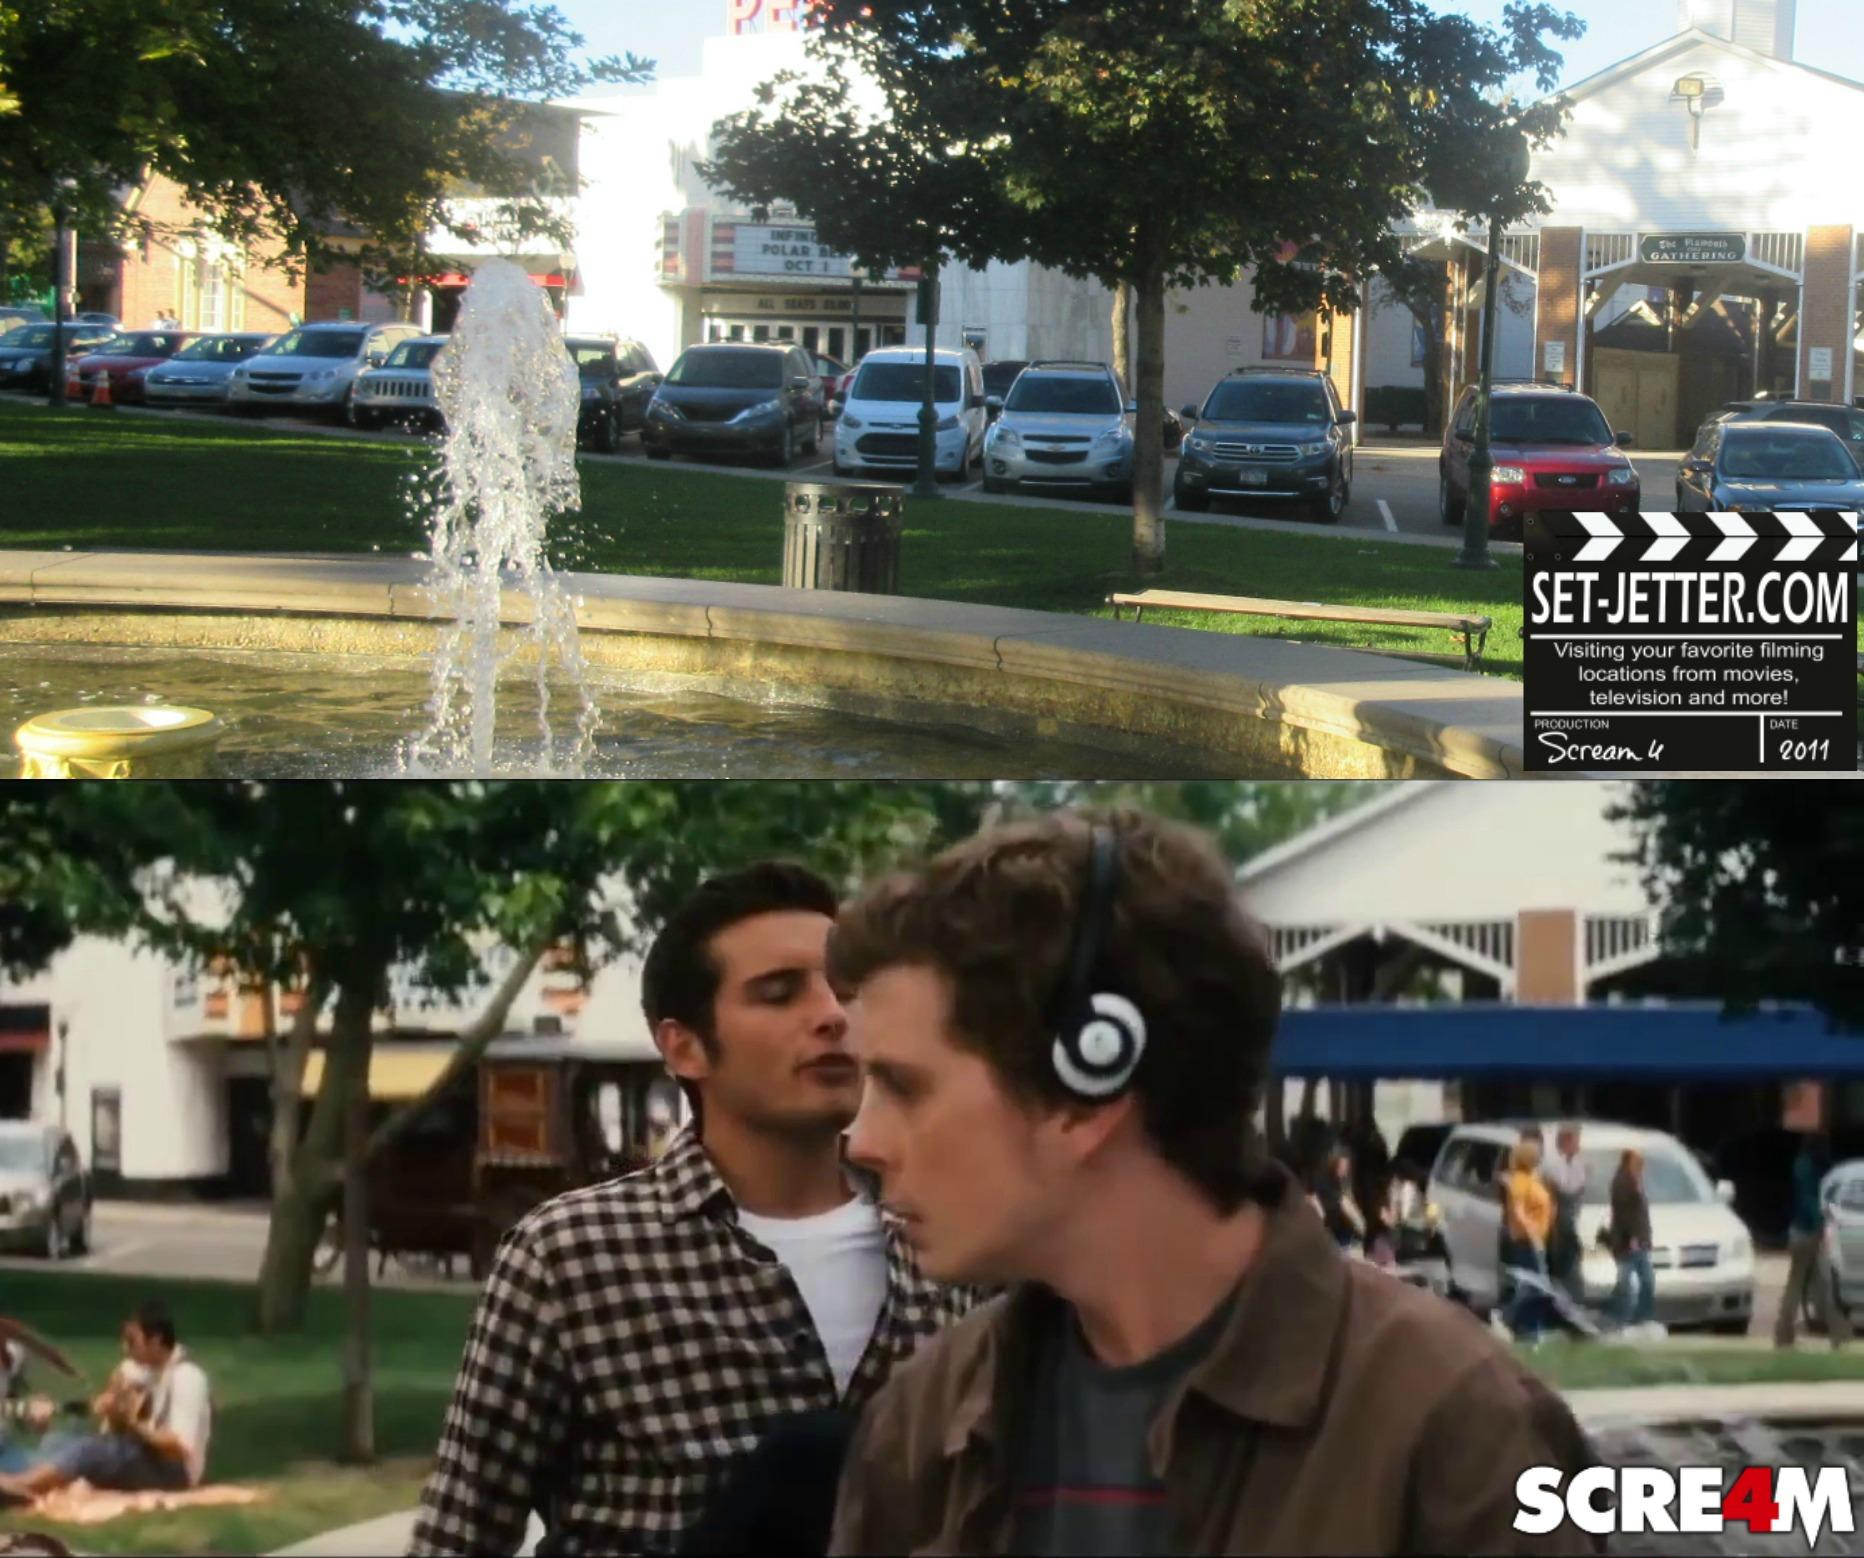 Scream4 comparison 156.jpg